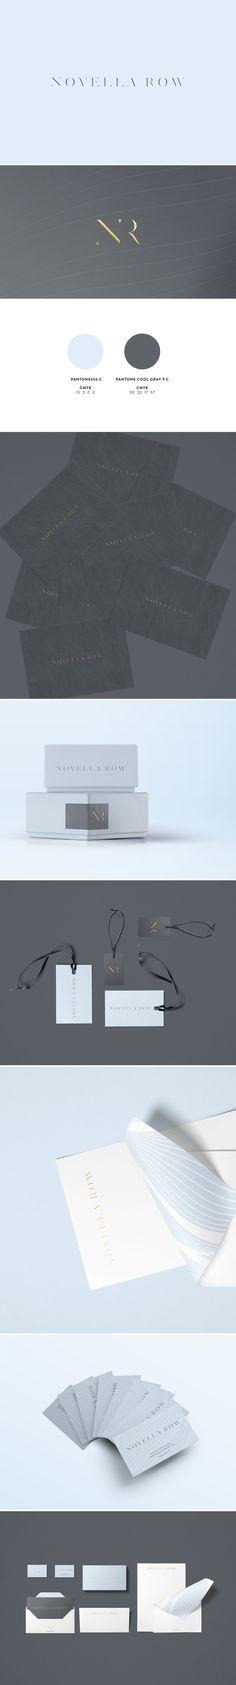 New in portfolio: Novella Row – Cocorrina